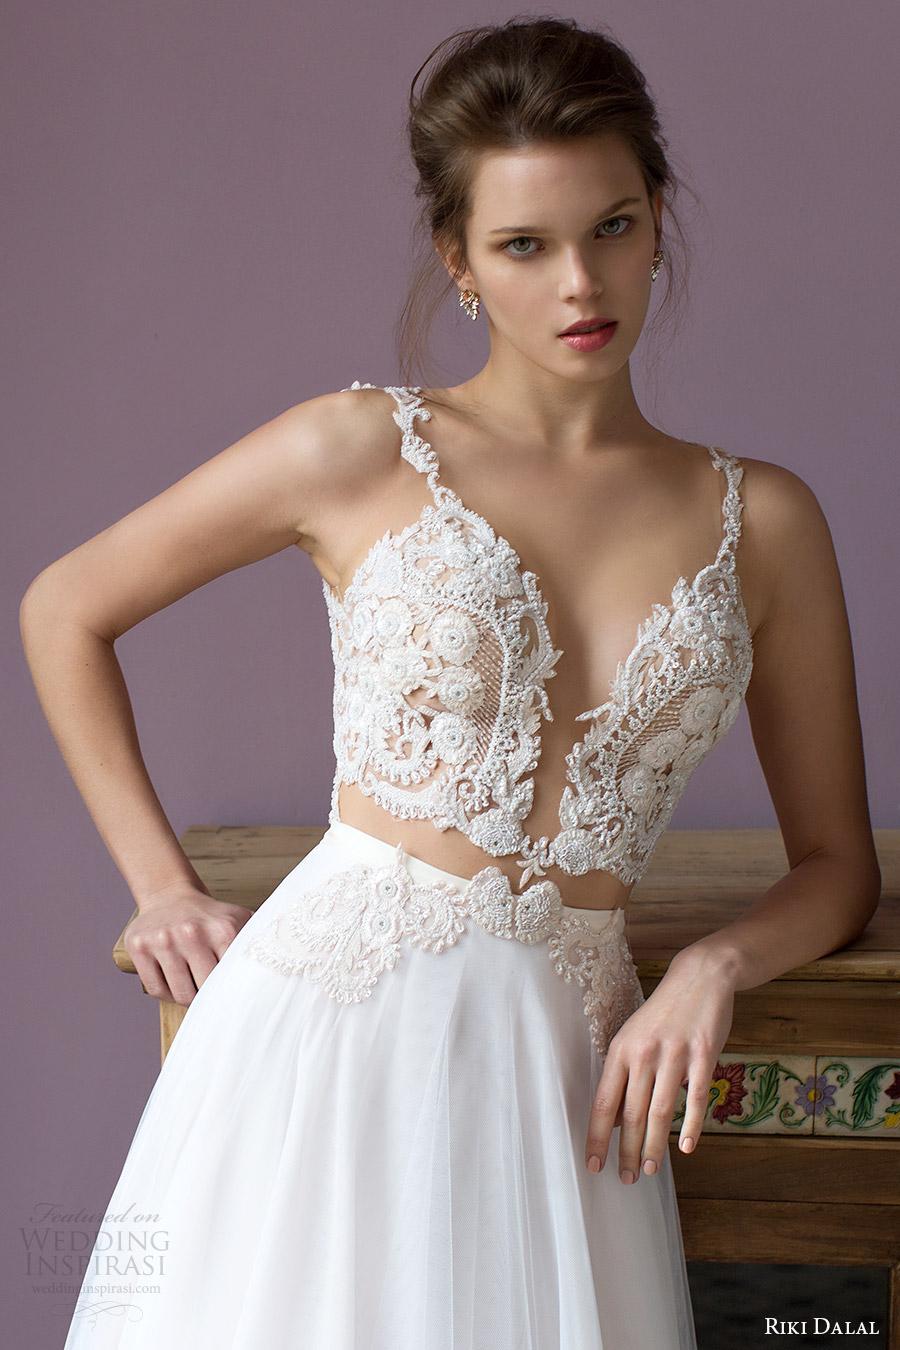 Riki Dalal 2016 Wedding Dresses Verona Bridal